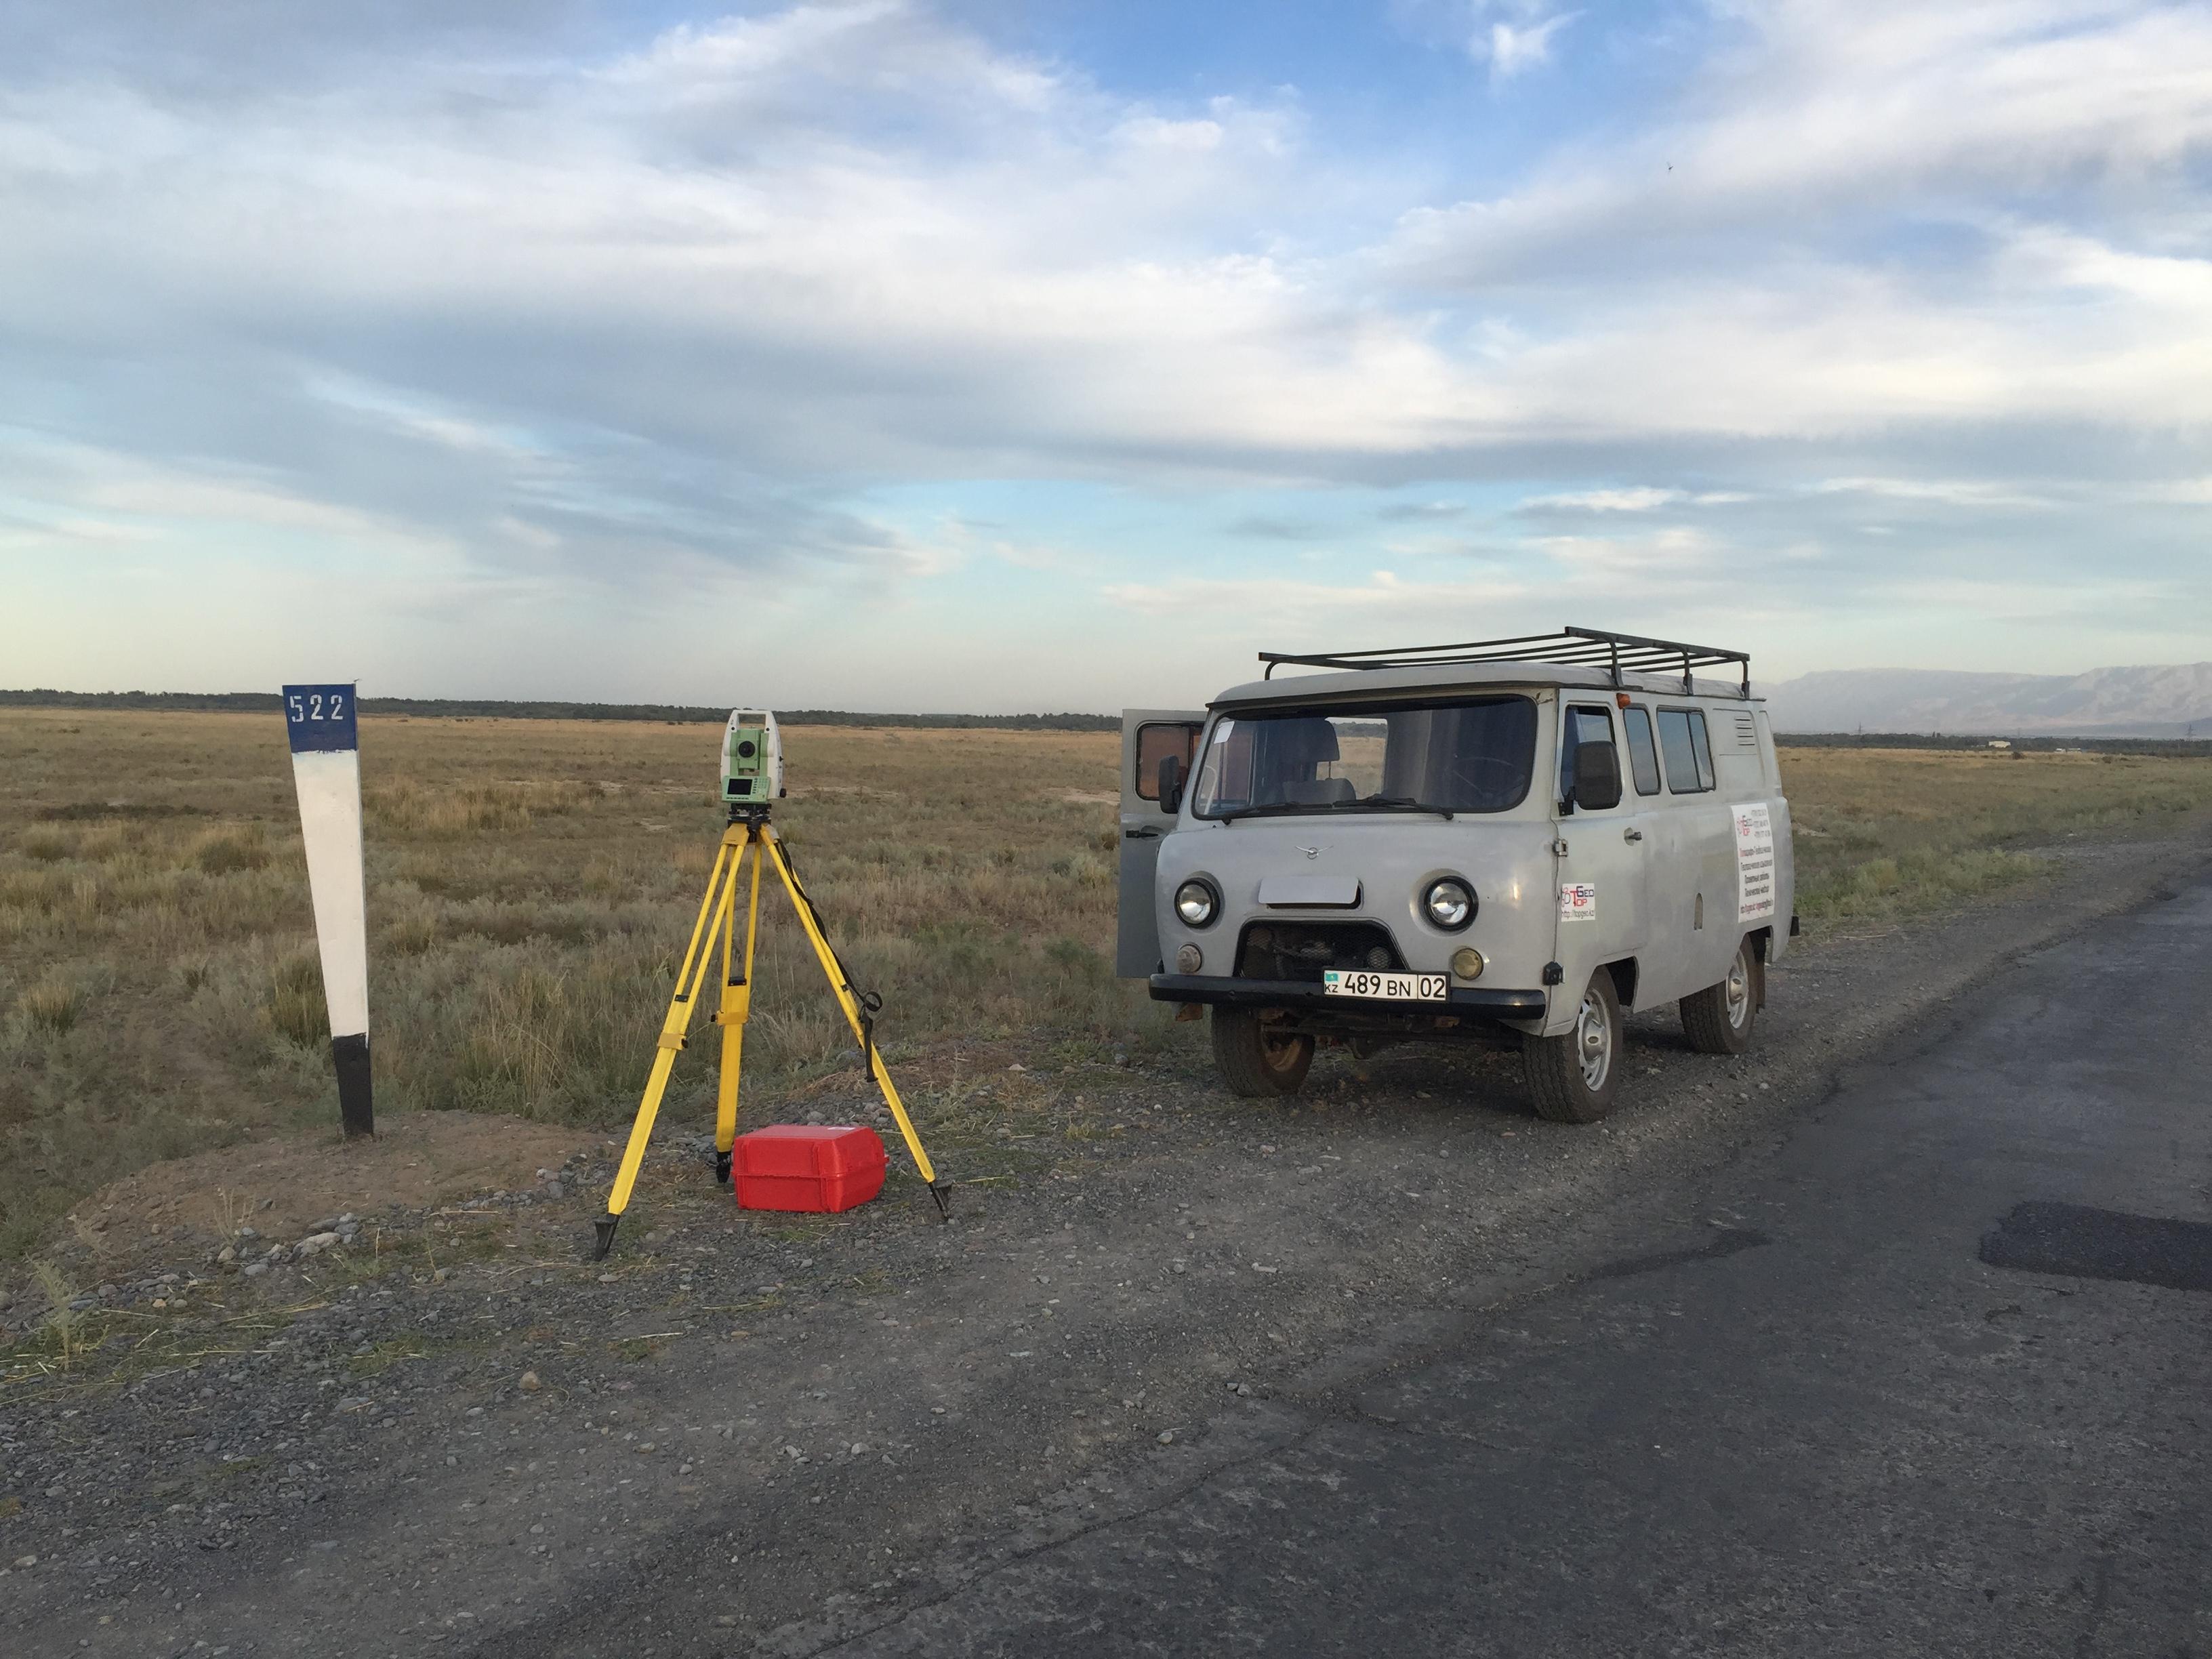 Автодорога Талдыкорган - Усть-Каменогорск